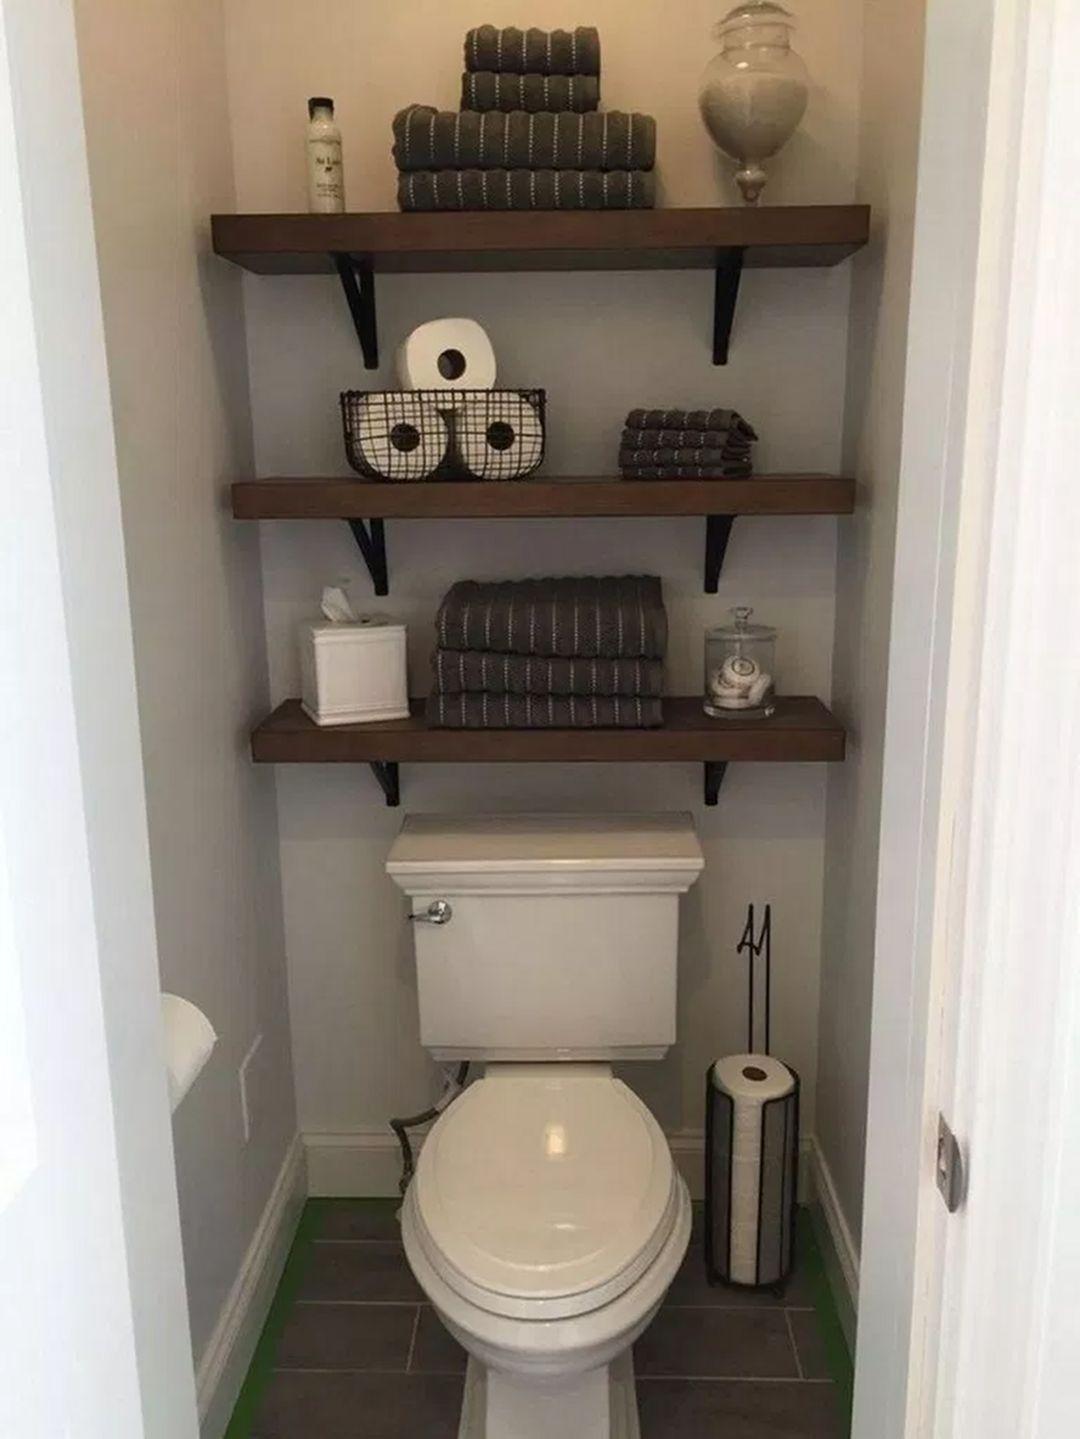 Top 15 Diy Bathroom Wall Shelves Ideas To Organize Easily Bathroomshelves Diyshelves Diy Small Bathroom Shelves Small Bathroom Storage Trendy Bathroom